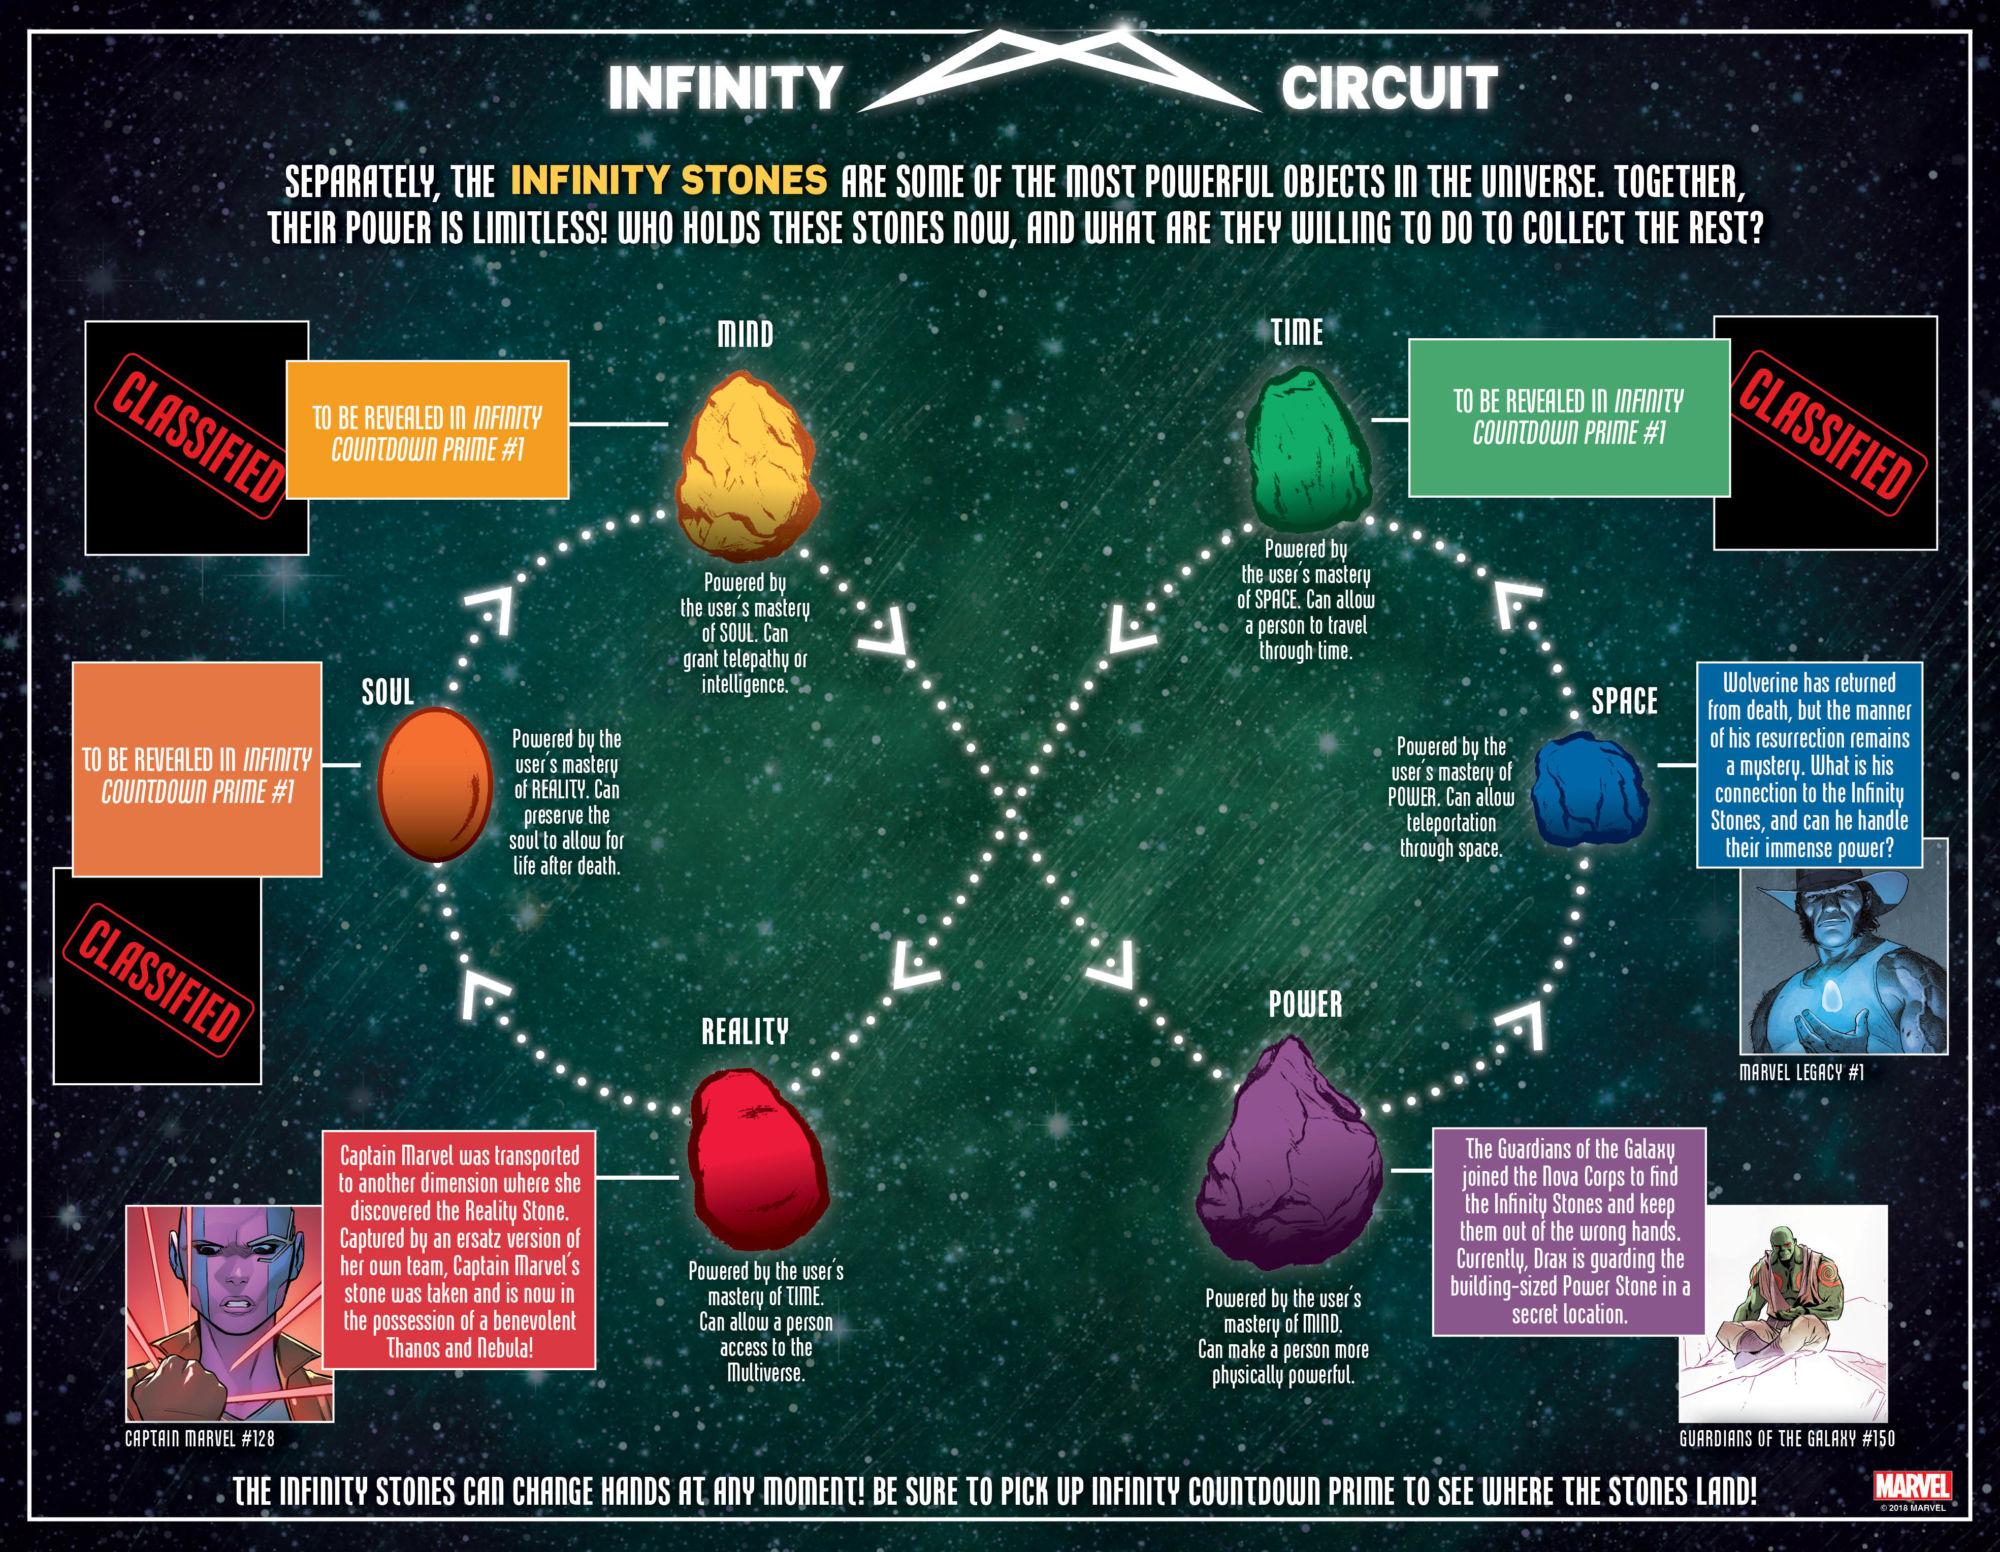 marvel reveals infinity circuit diagram to help you understand rh bleedingcool com Series Circuit Diagram Parallel Circuit Diagram